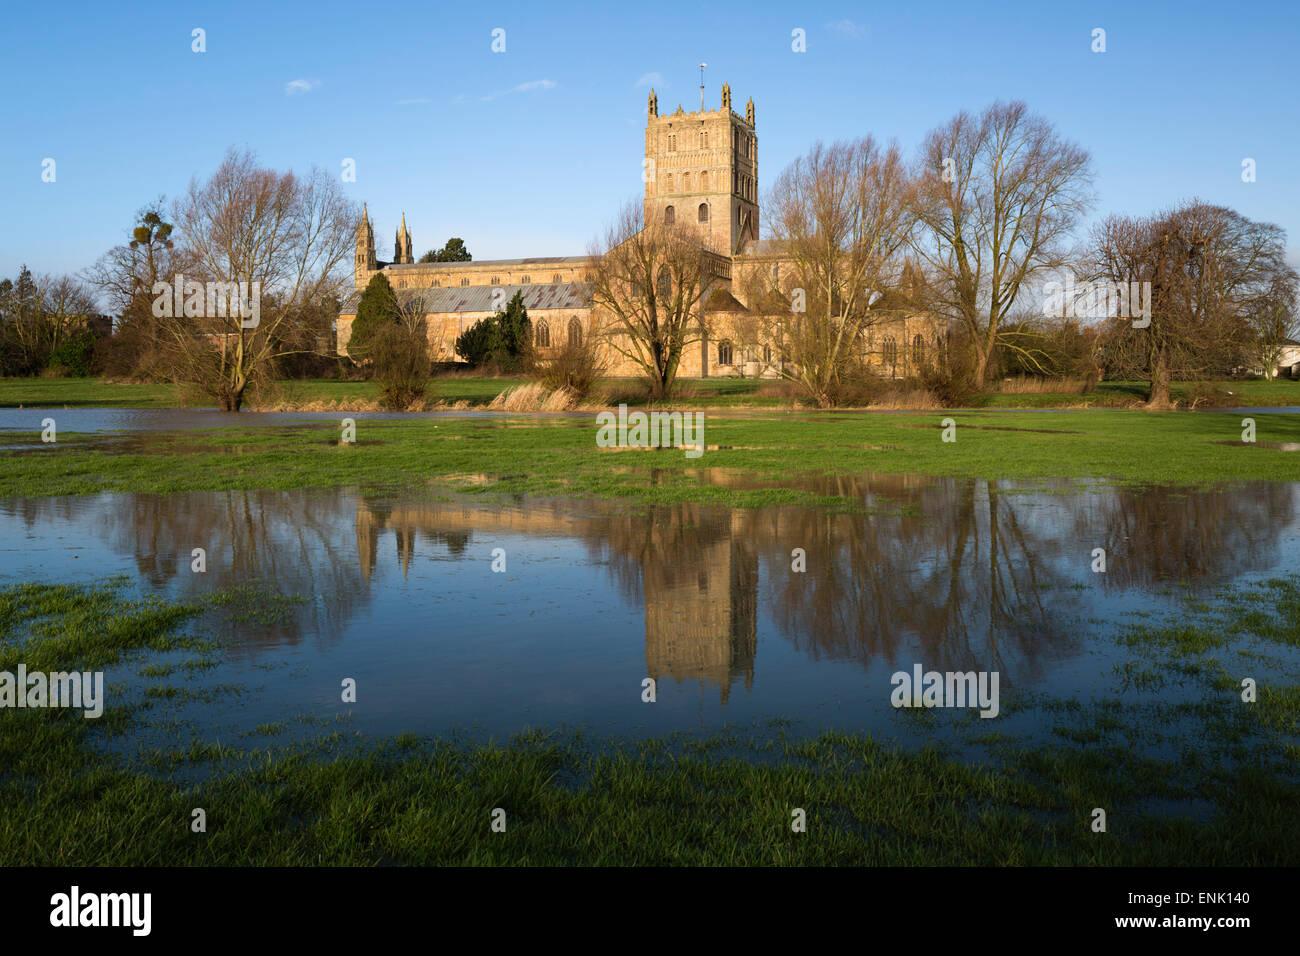 Abbaye de Tewkesbury reflète dans la prairie inondée, Tewkesbury, Gloucestershire, Angleterre, Royaume Photo Stock